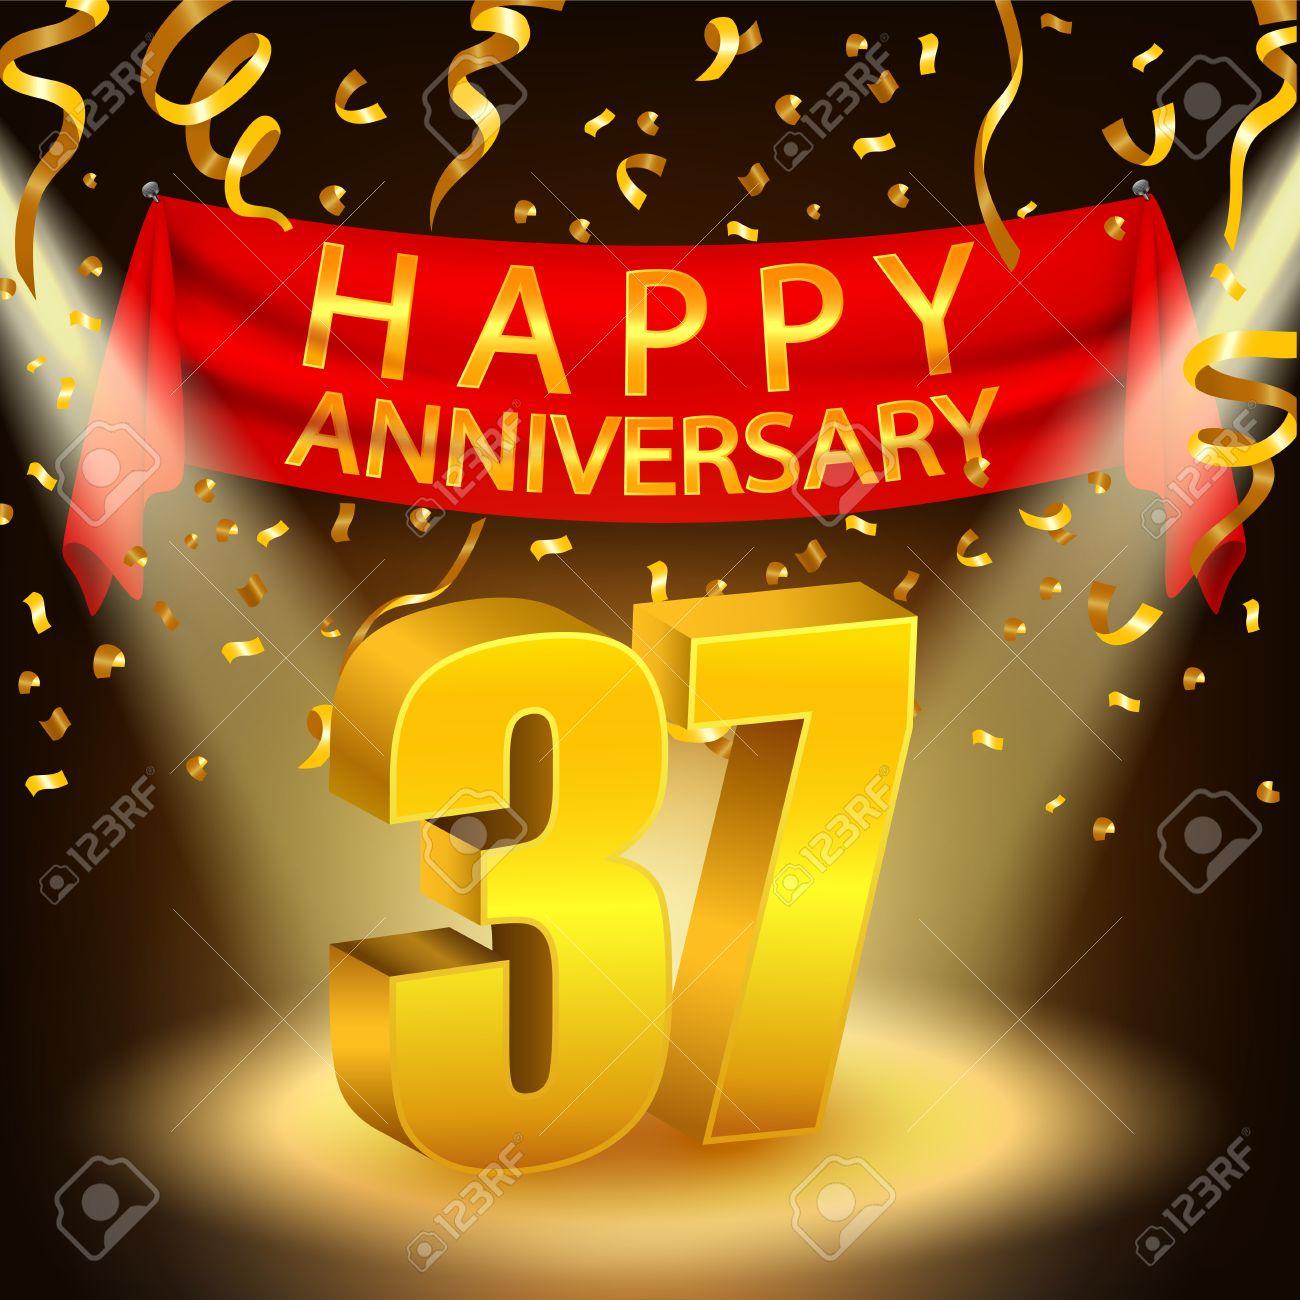 Happy 37th Anniversary Celebration With Golden Confetti And